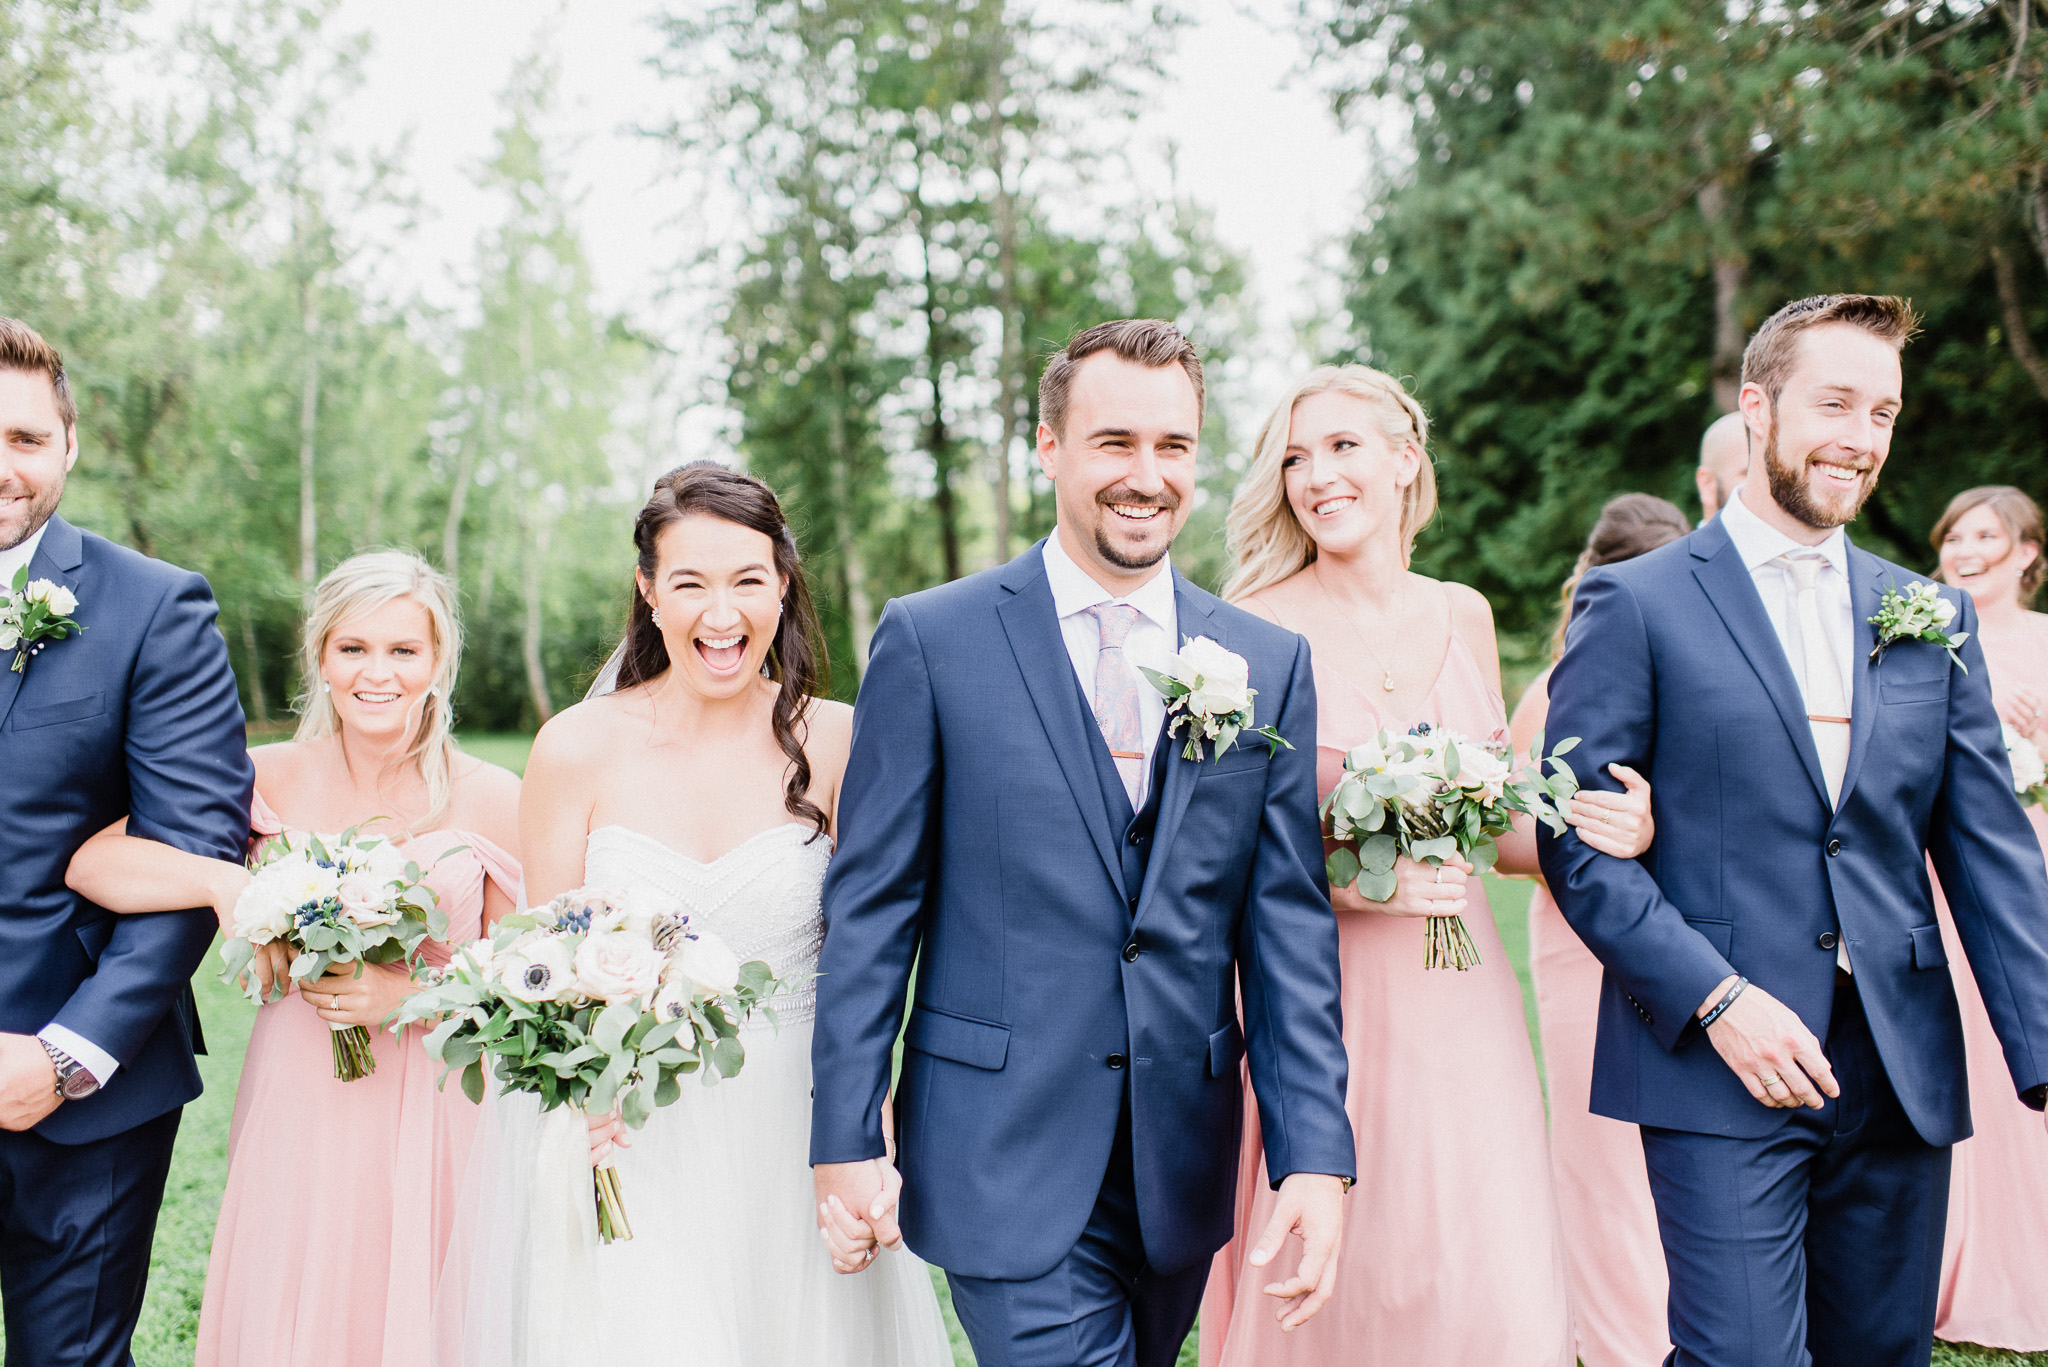 Holland Marsh Wineries wedding photos by Jenn Kavanagh Photography